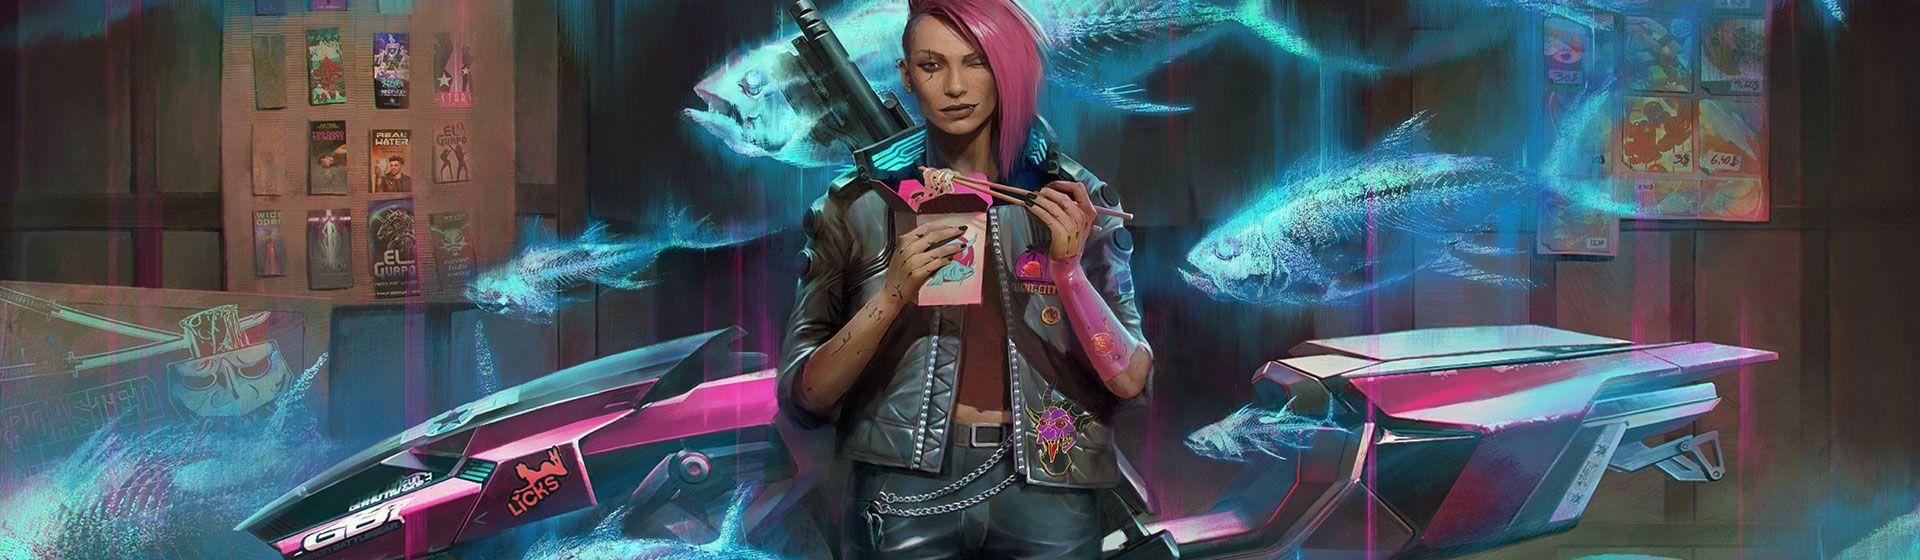 Cyberpunk 2077 é recriado como jogo de PS1 e viraliza